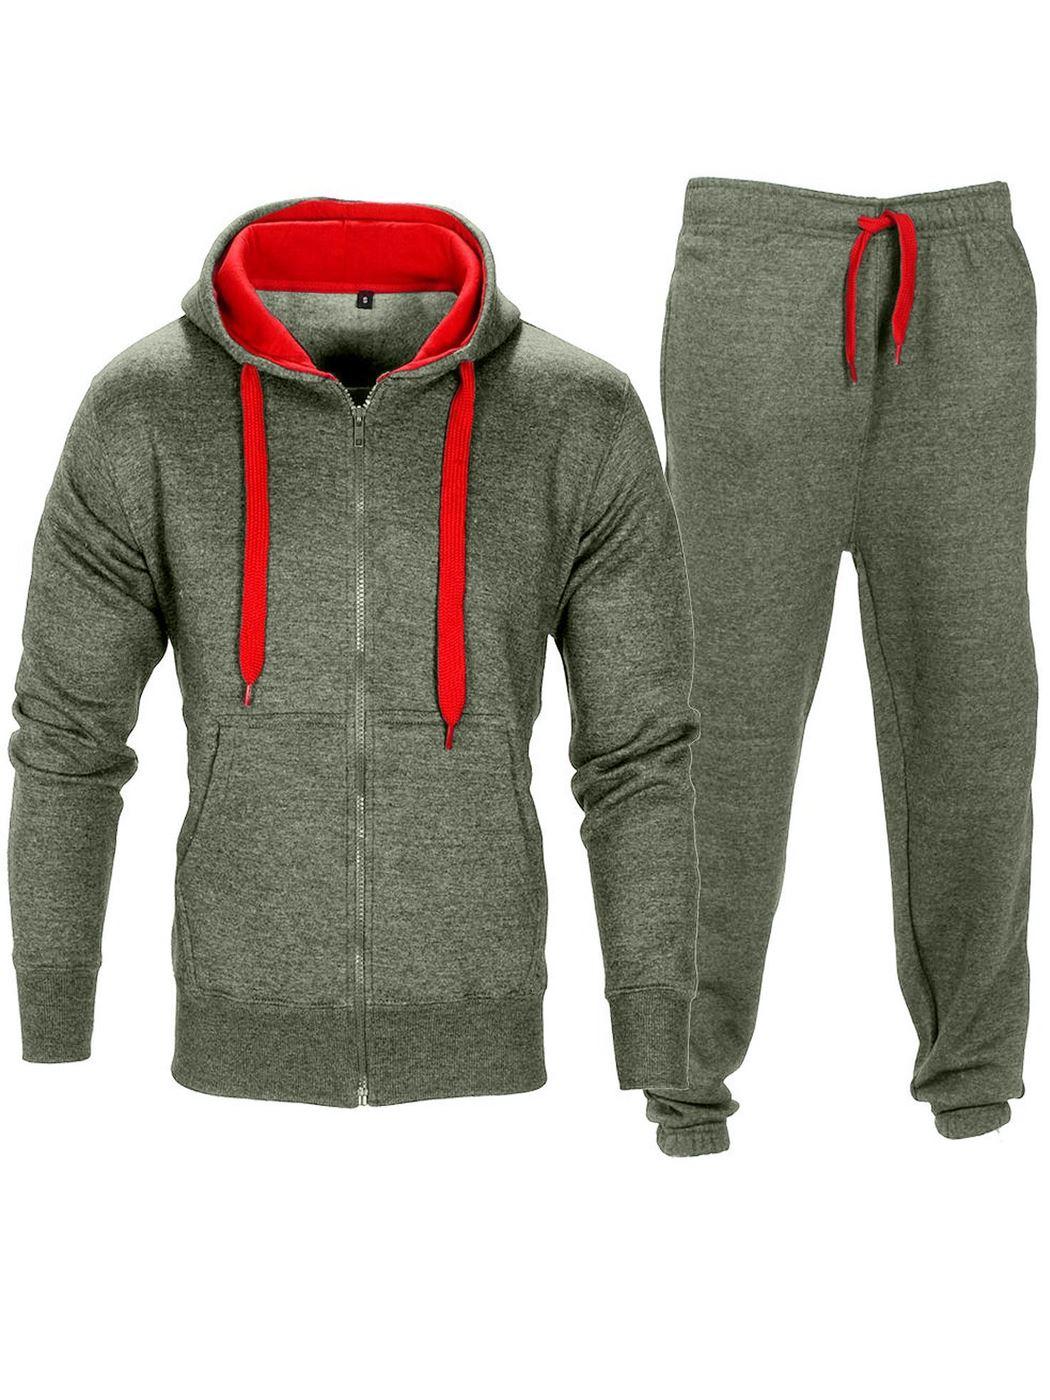 New Mens Tracksuit Set Full Top Bottoms Fleece Jogging Joggers Pullover Jumper